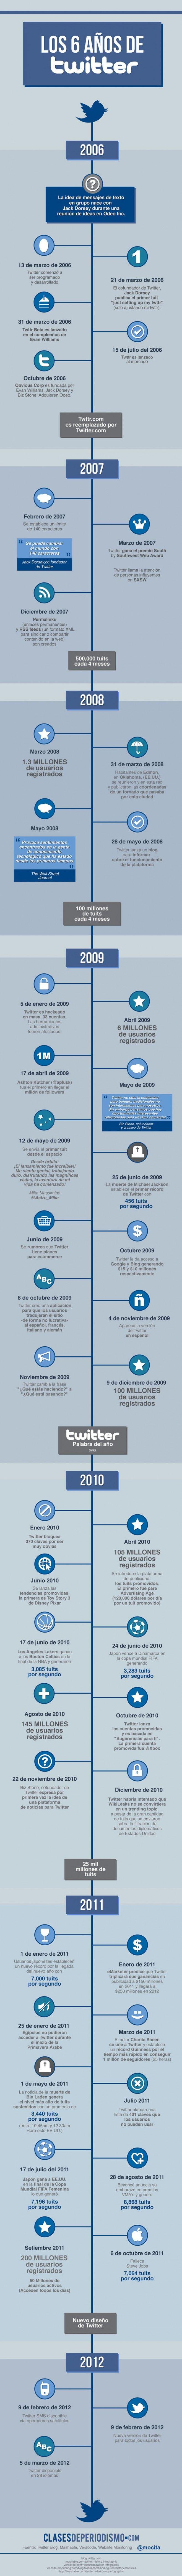 Los 6 años de Twitter. #infografia #infographic #twitter #socialmedia